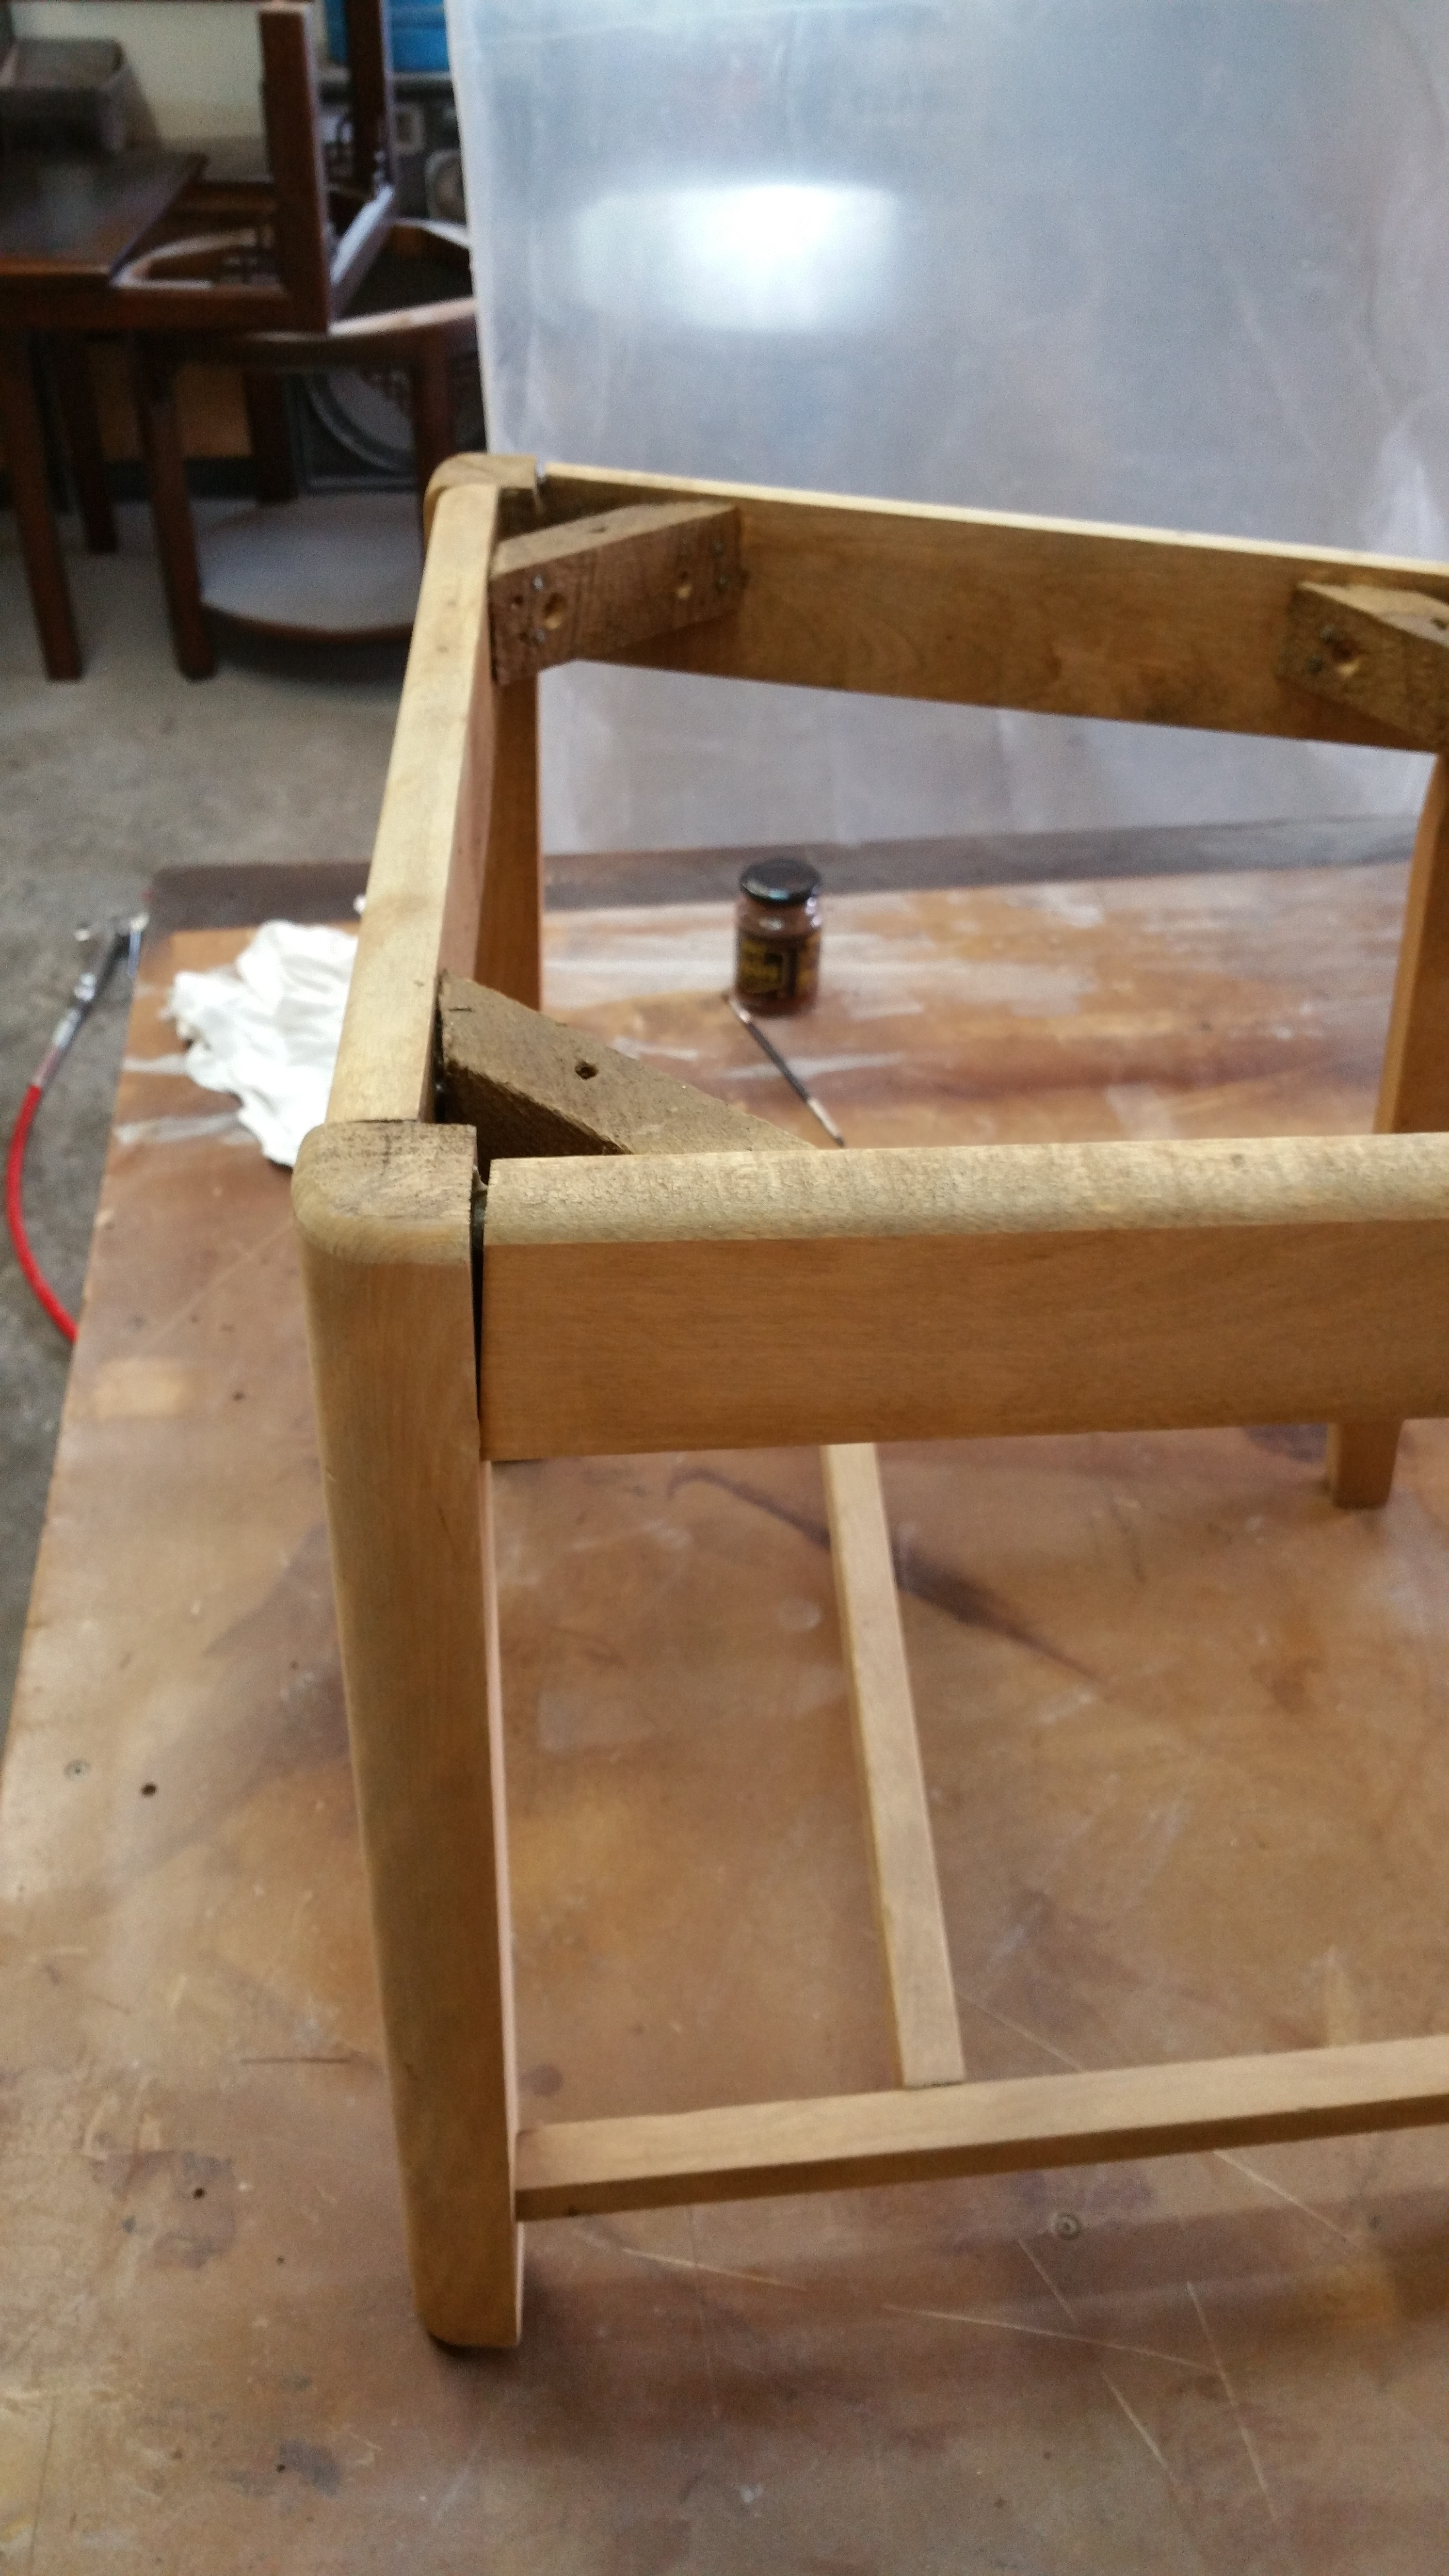 8 chairs needed repair